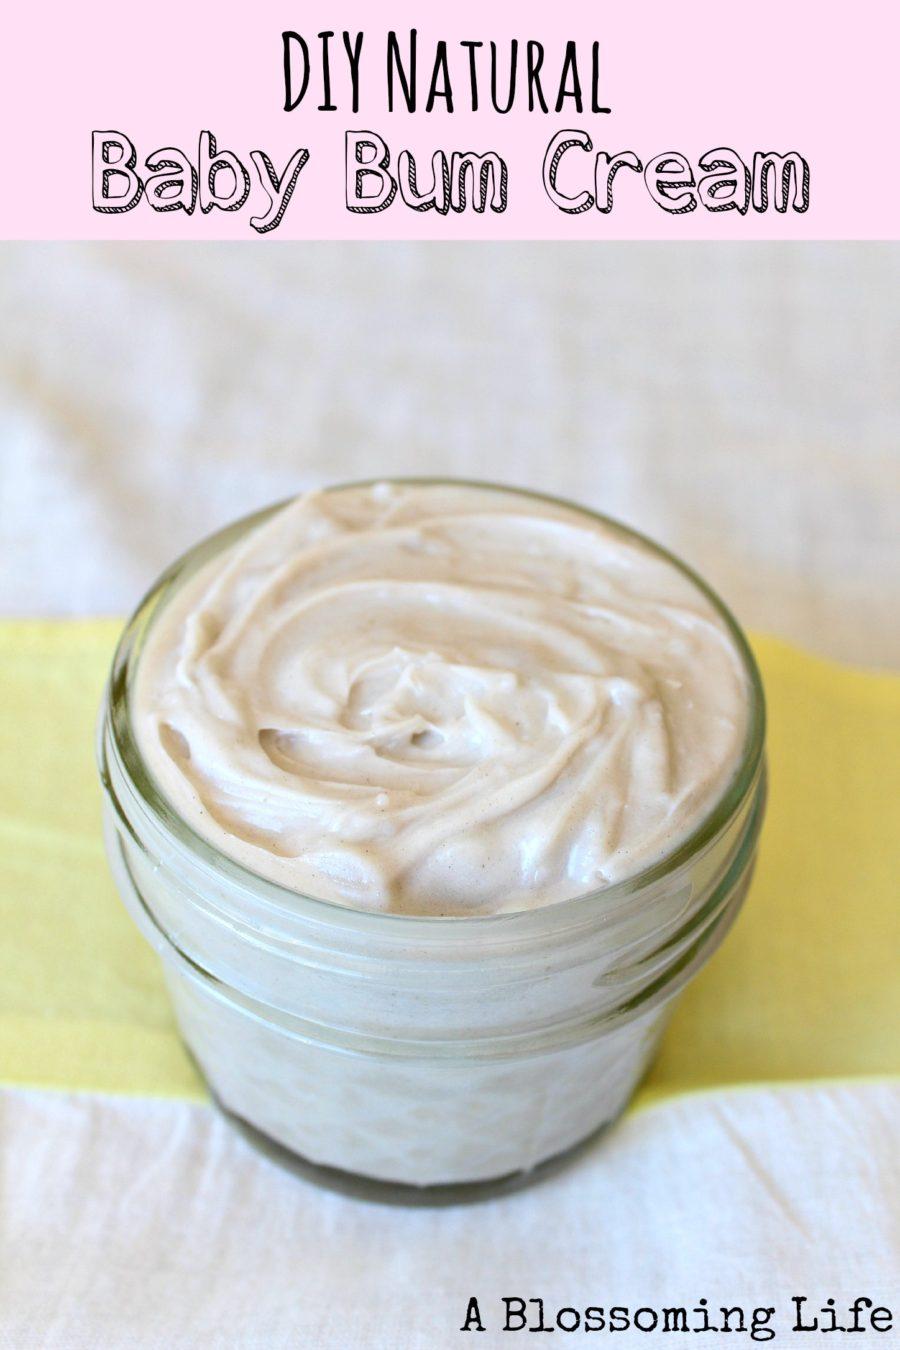 DIY Natural Baby Bum Cream